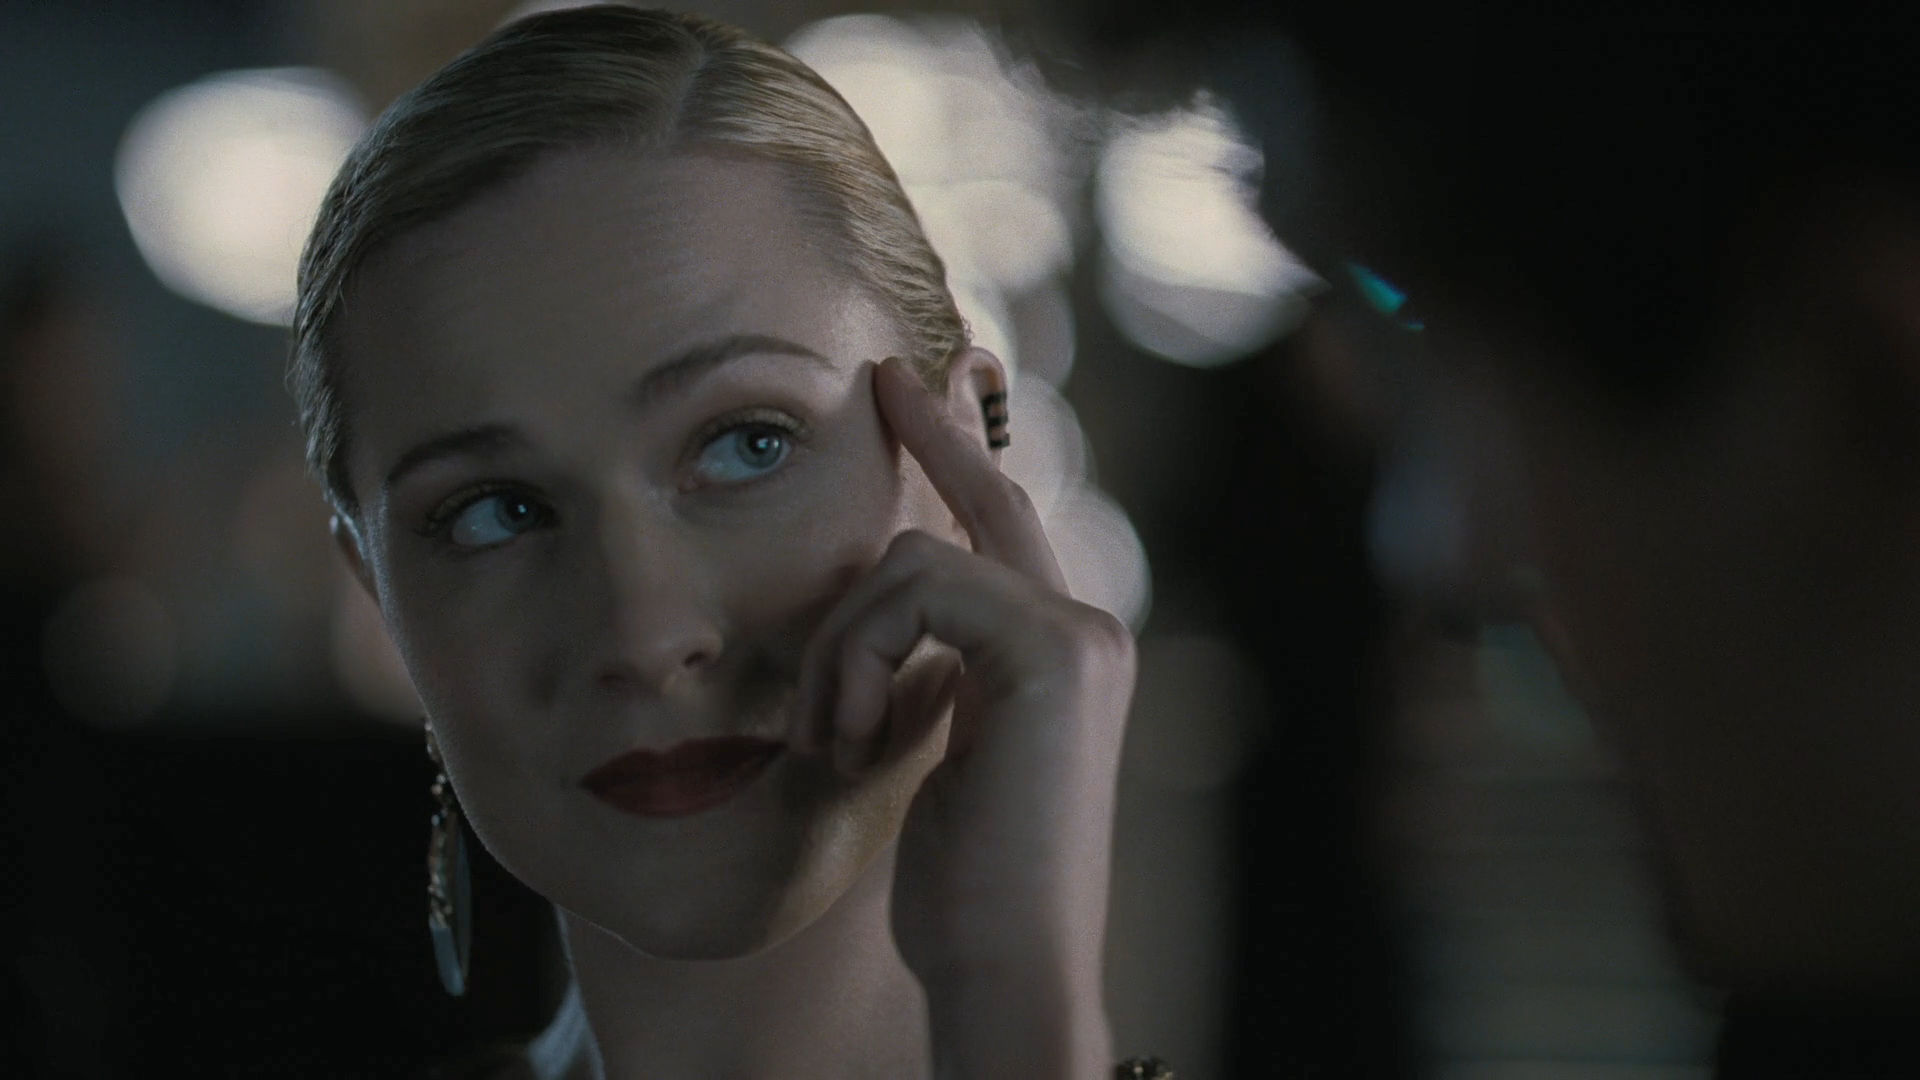 Westworld Season 3 Episode 1 Review Evan Rachel Wood as Dolores